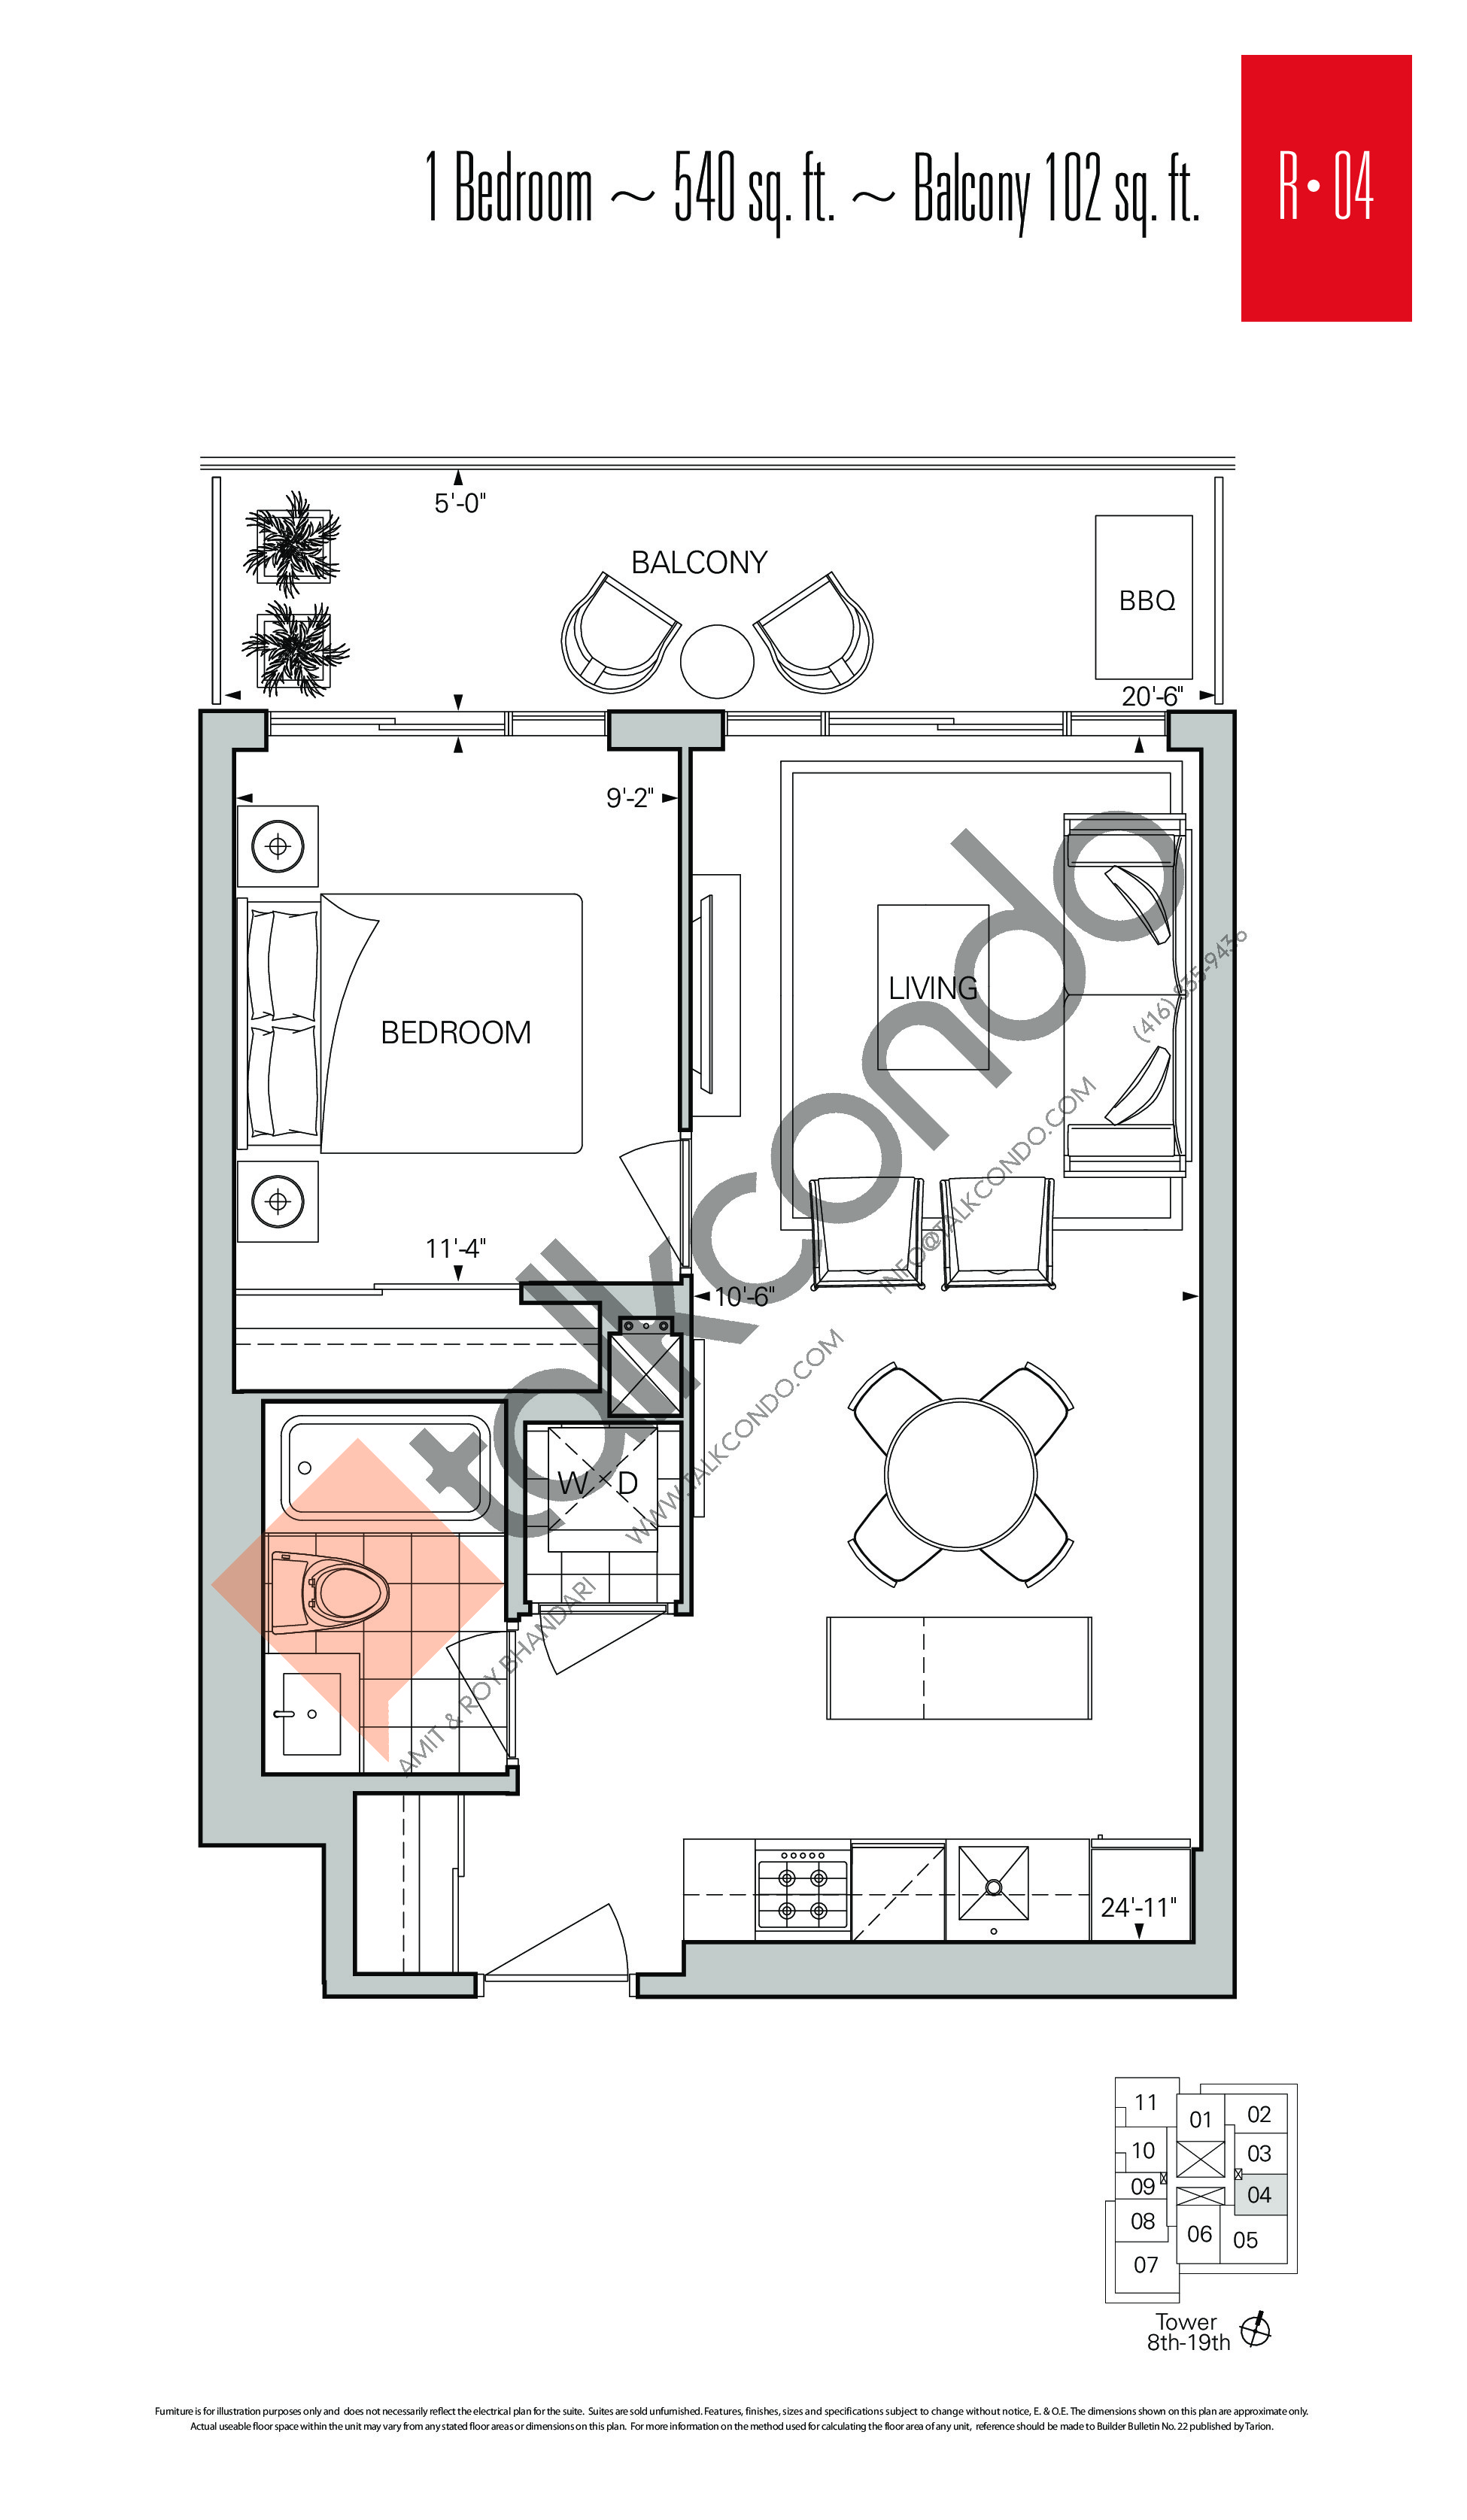 R-04 Floor Plan at Rise Condos - 540 sq.ft